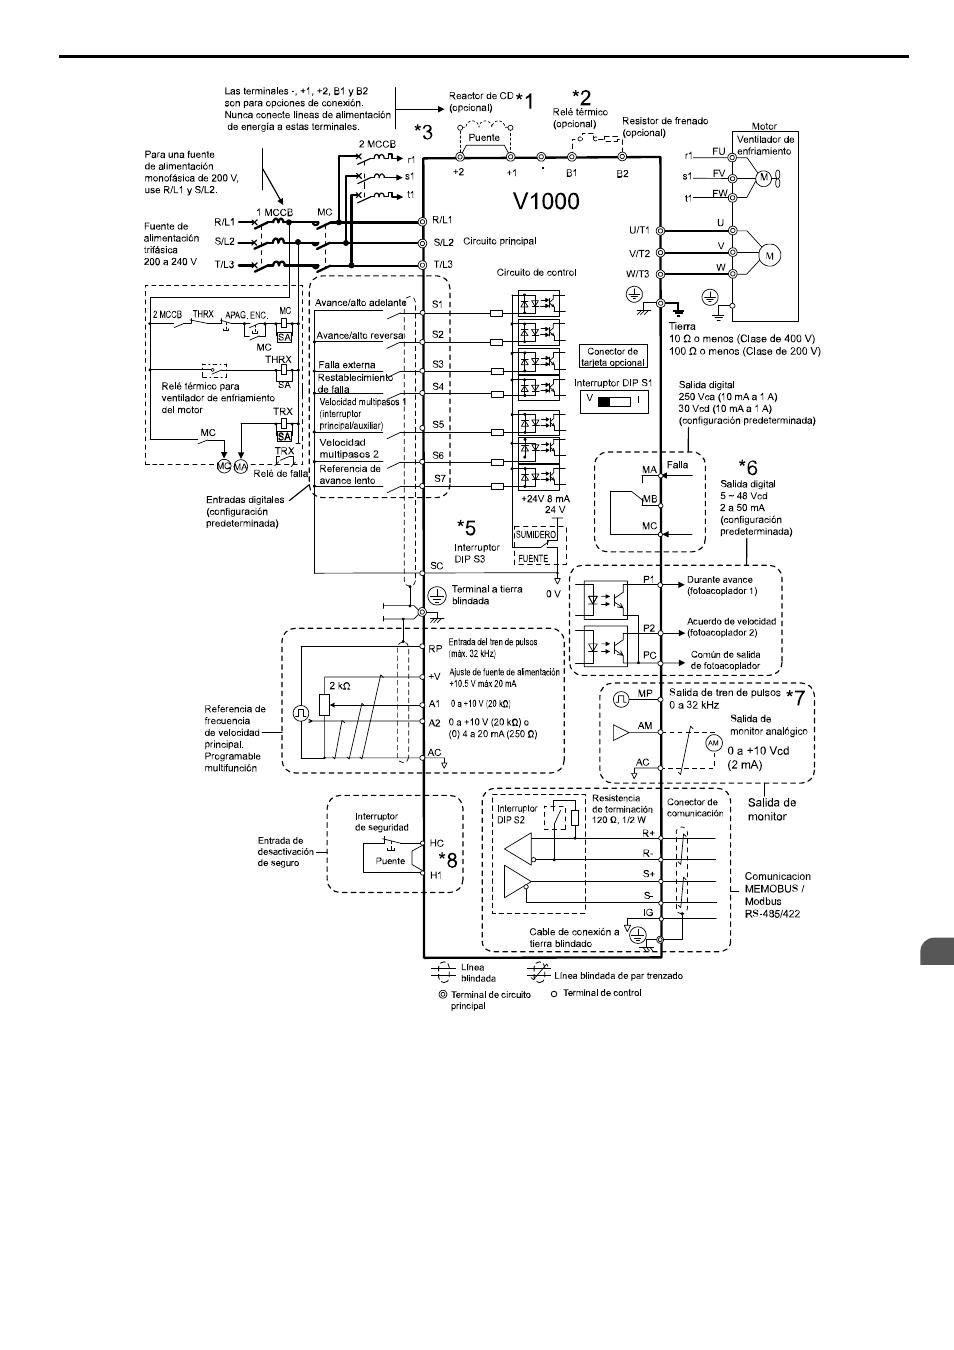 doc043 yaskawa v1000 wiring diagram yaskawa vfd wiring diagrams, yaskawa yaskawa p7 wiring diagram at crackthecode.co